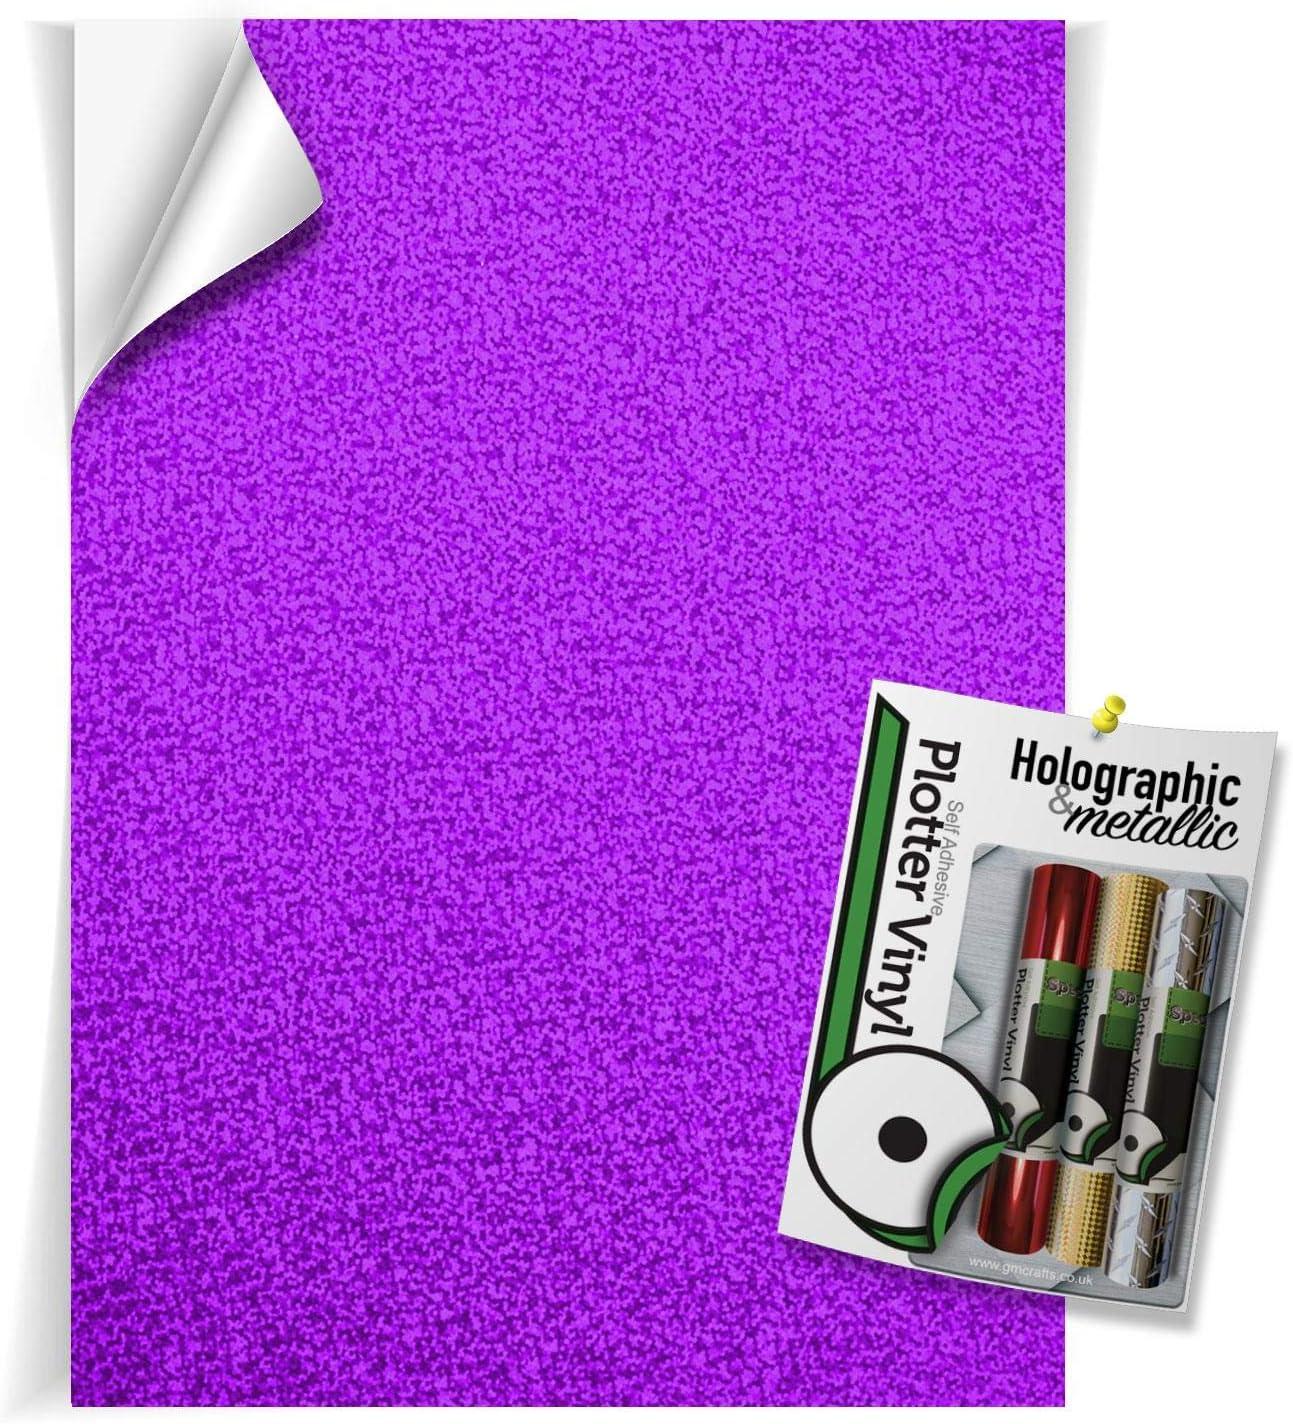 Vinilo holográfico – Hoja Holographic Purple: Amazon.es: Hogar